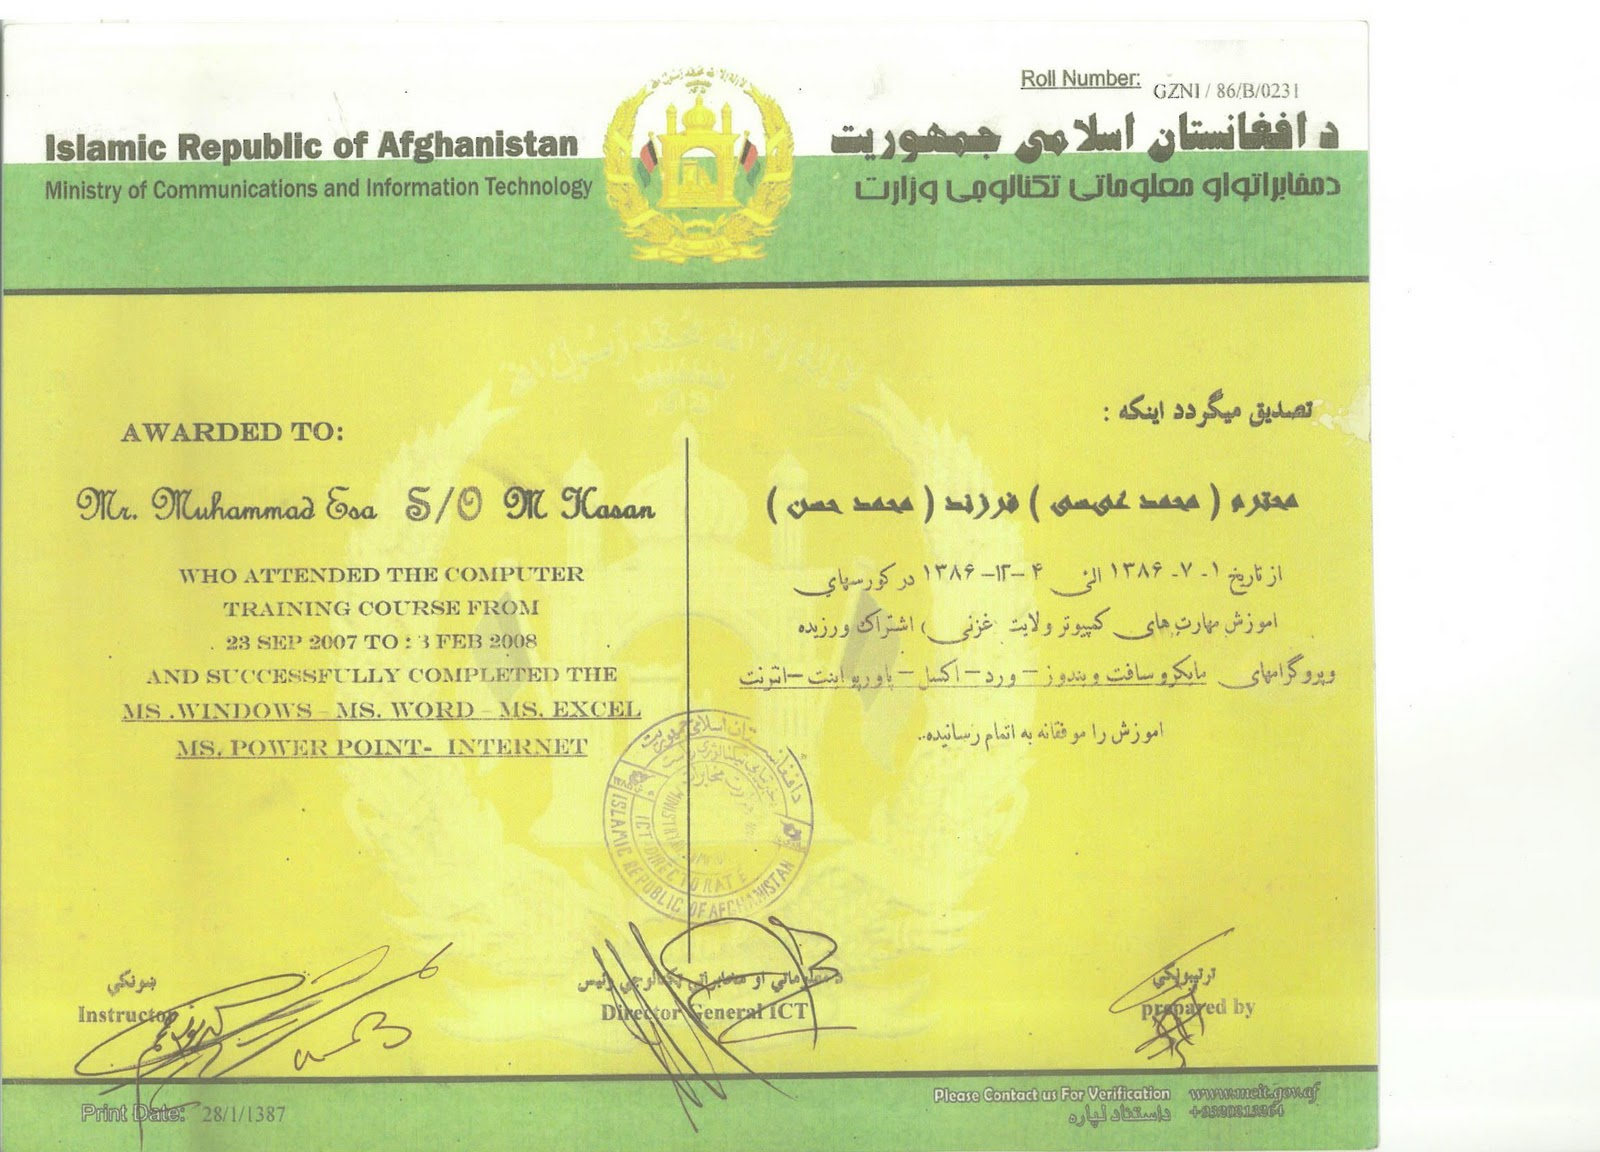 mohammad esa sahel resume march 2011